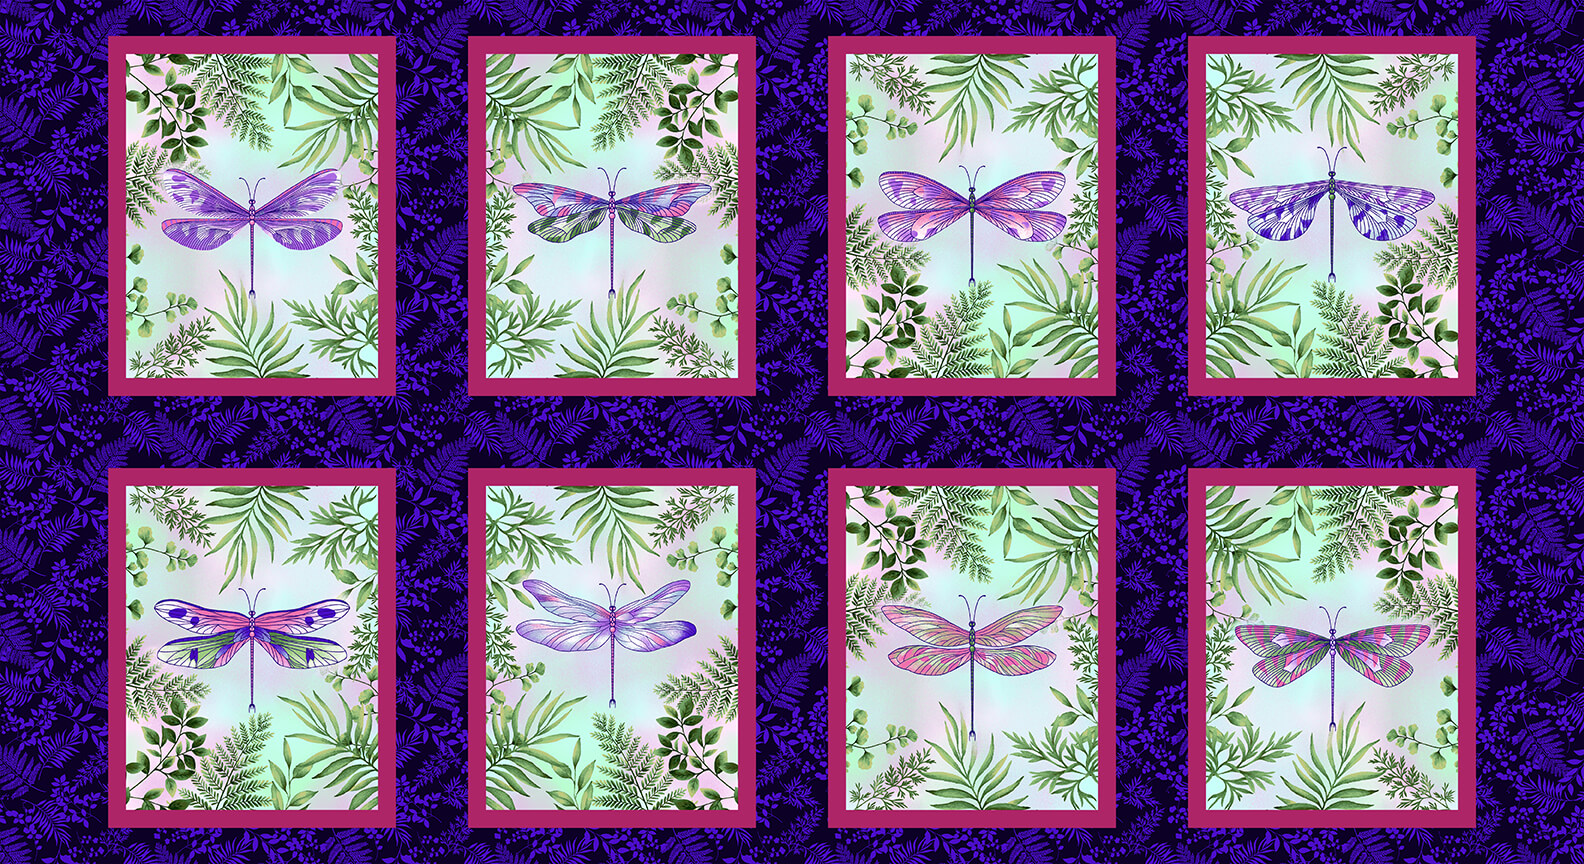 Dragonfly Garden Panel 2460-77 Royal